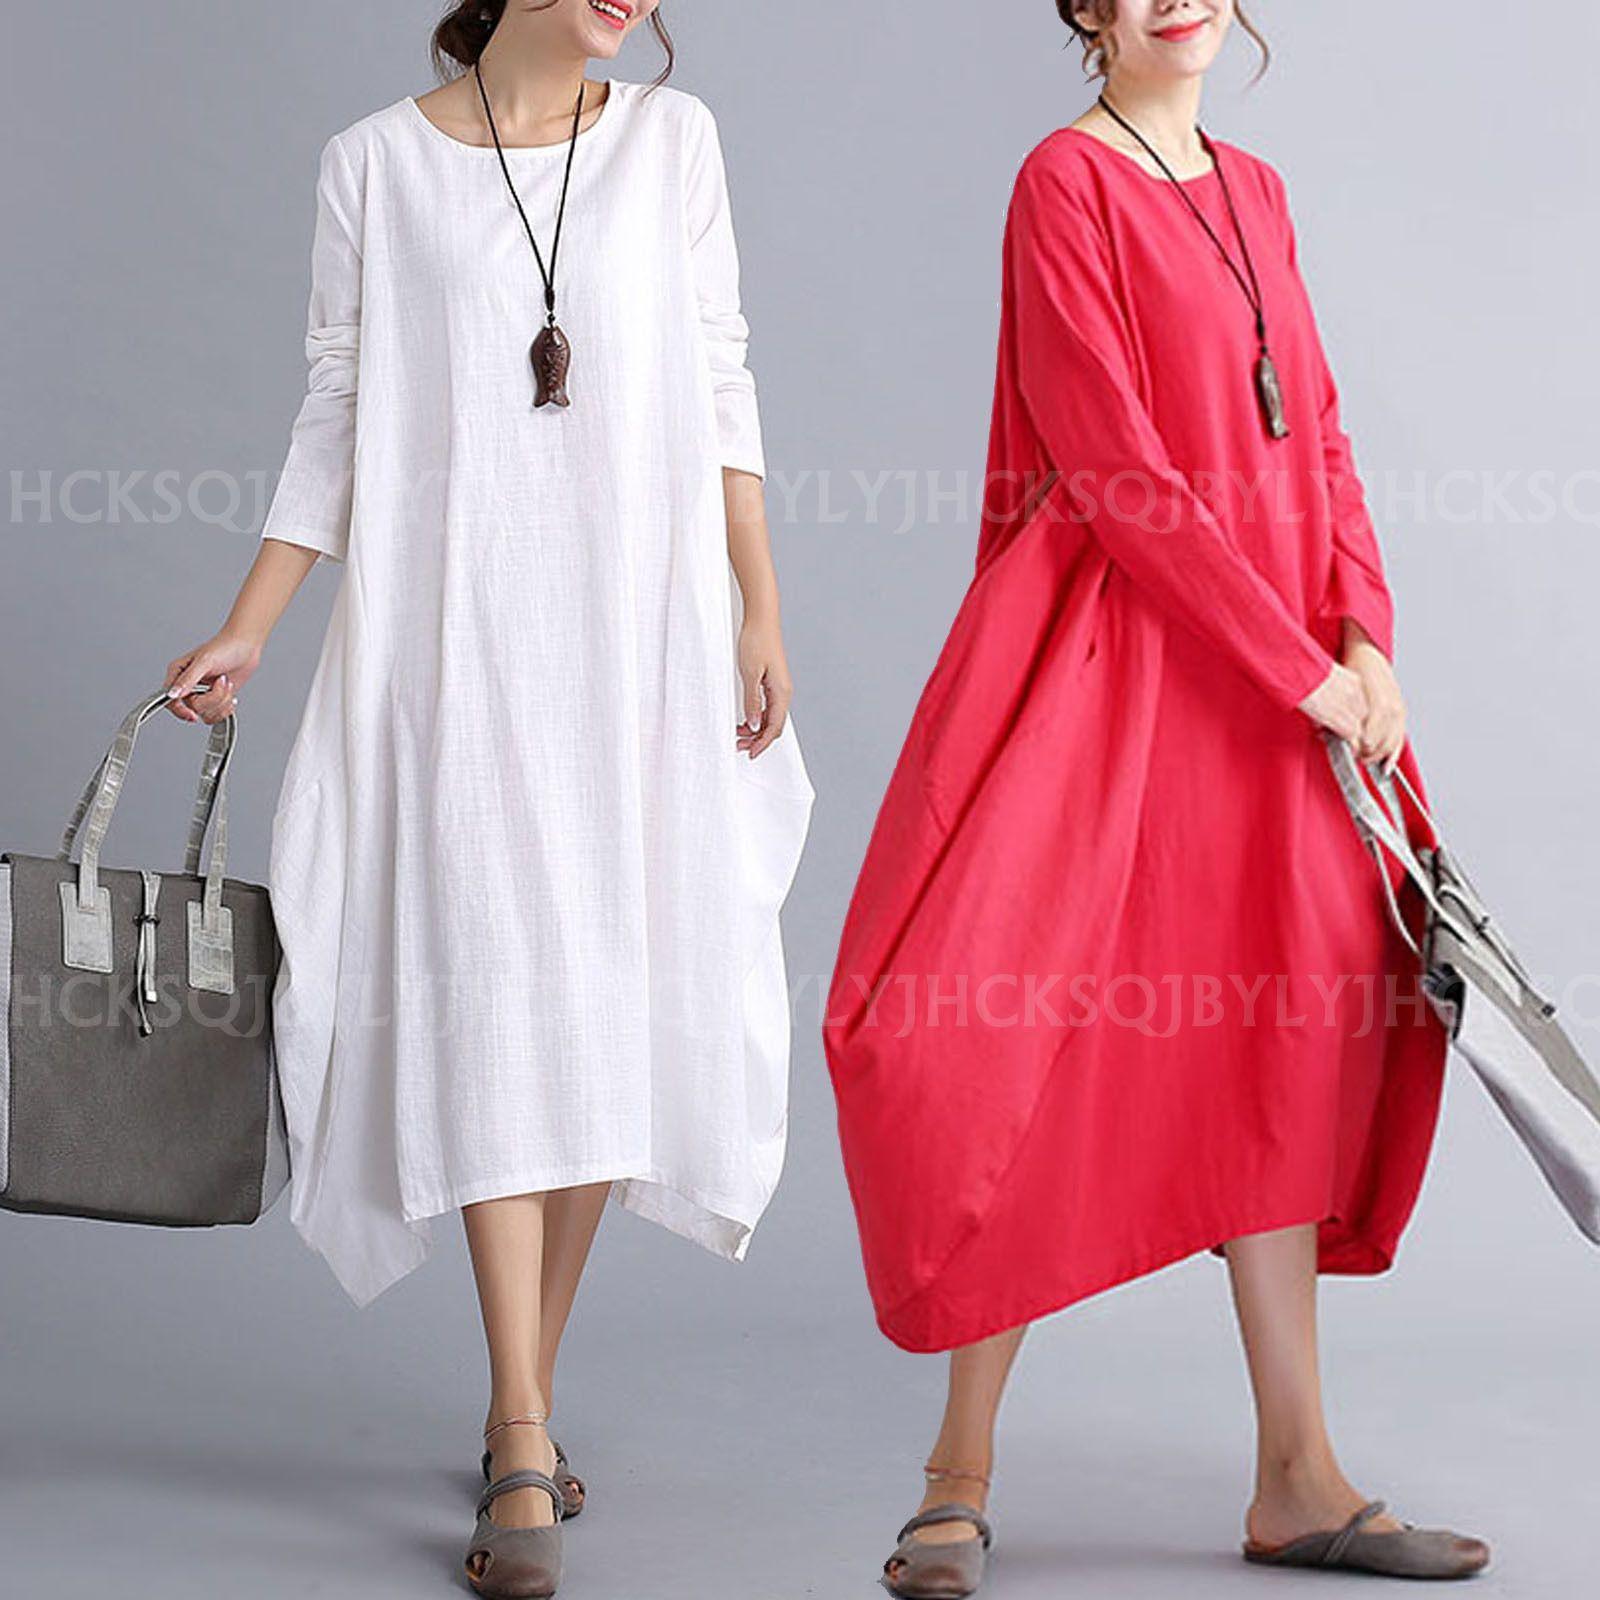 Autumn ladies long sleeve casual loose cotton linen boho maxi shirt